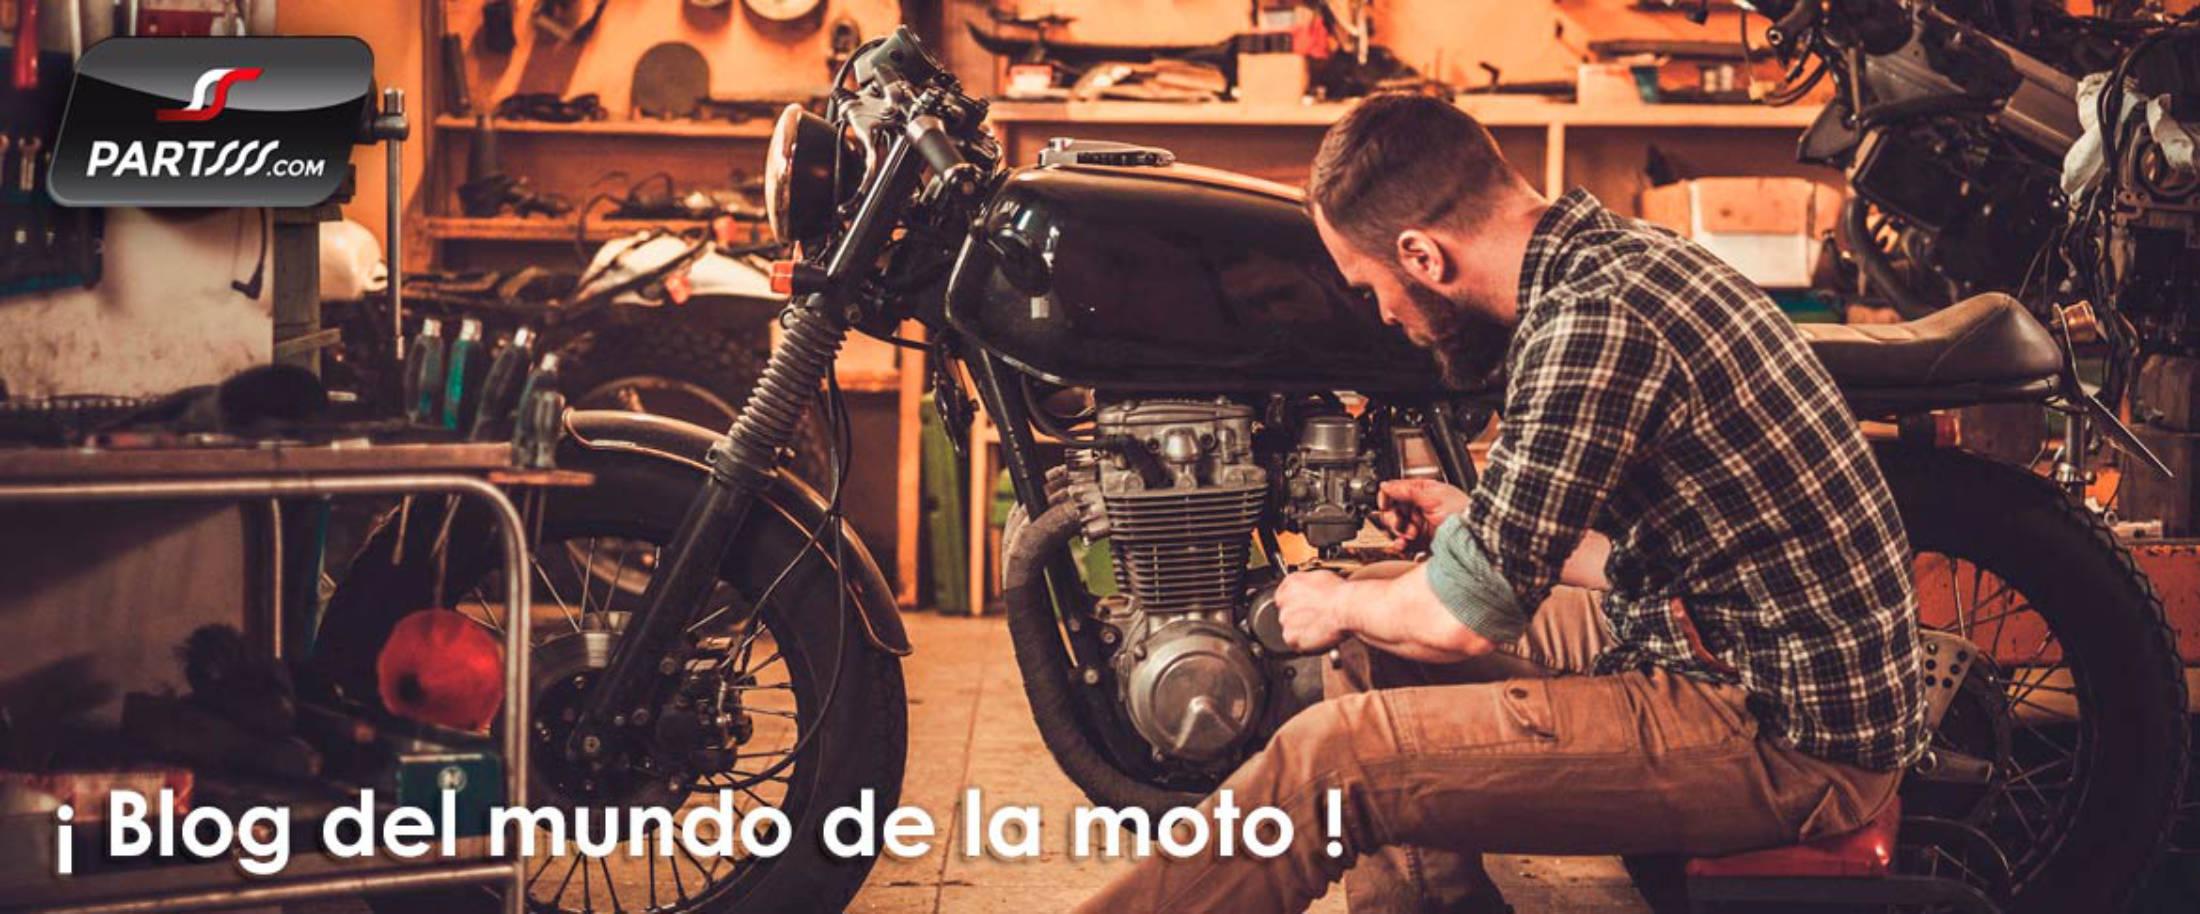 Blog repuestos moto - Partsss